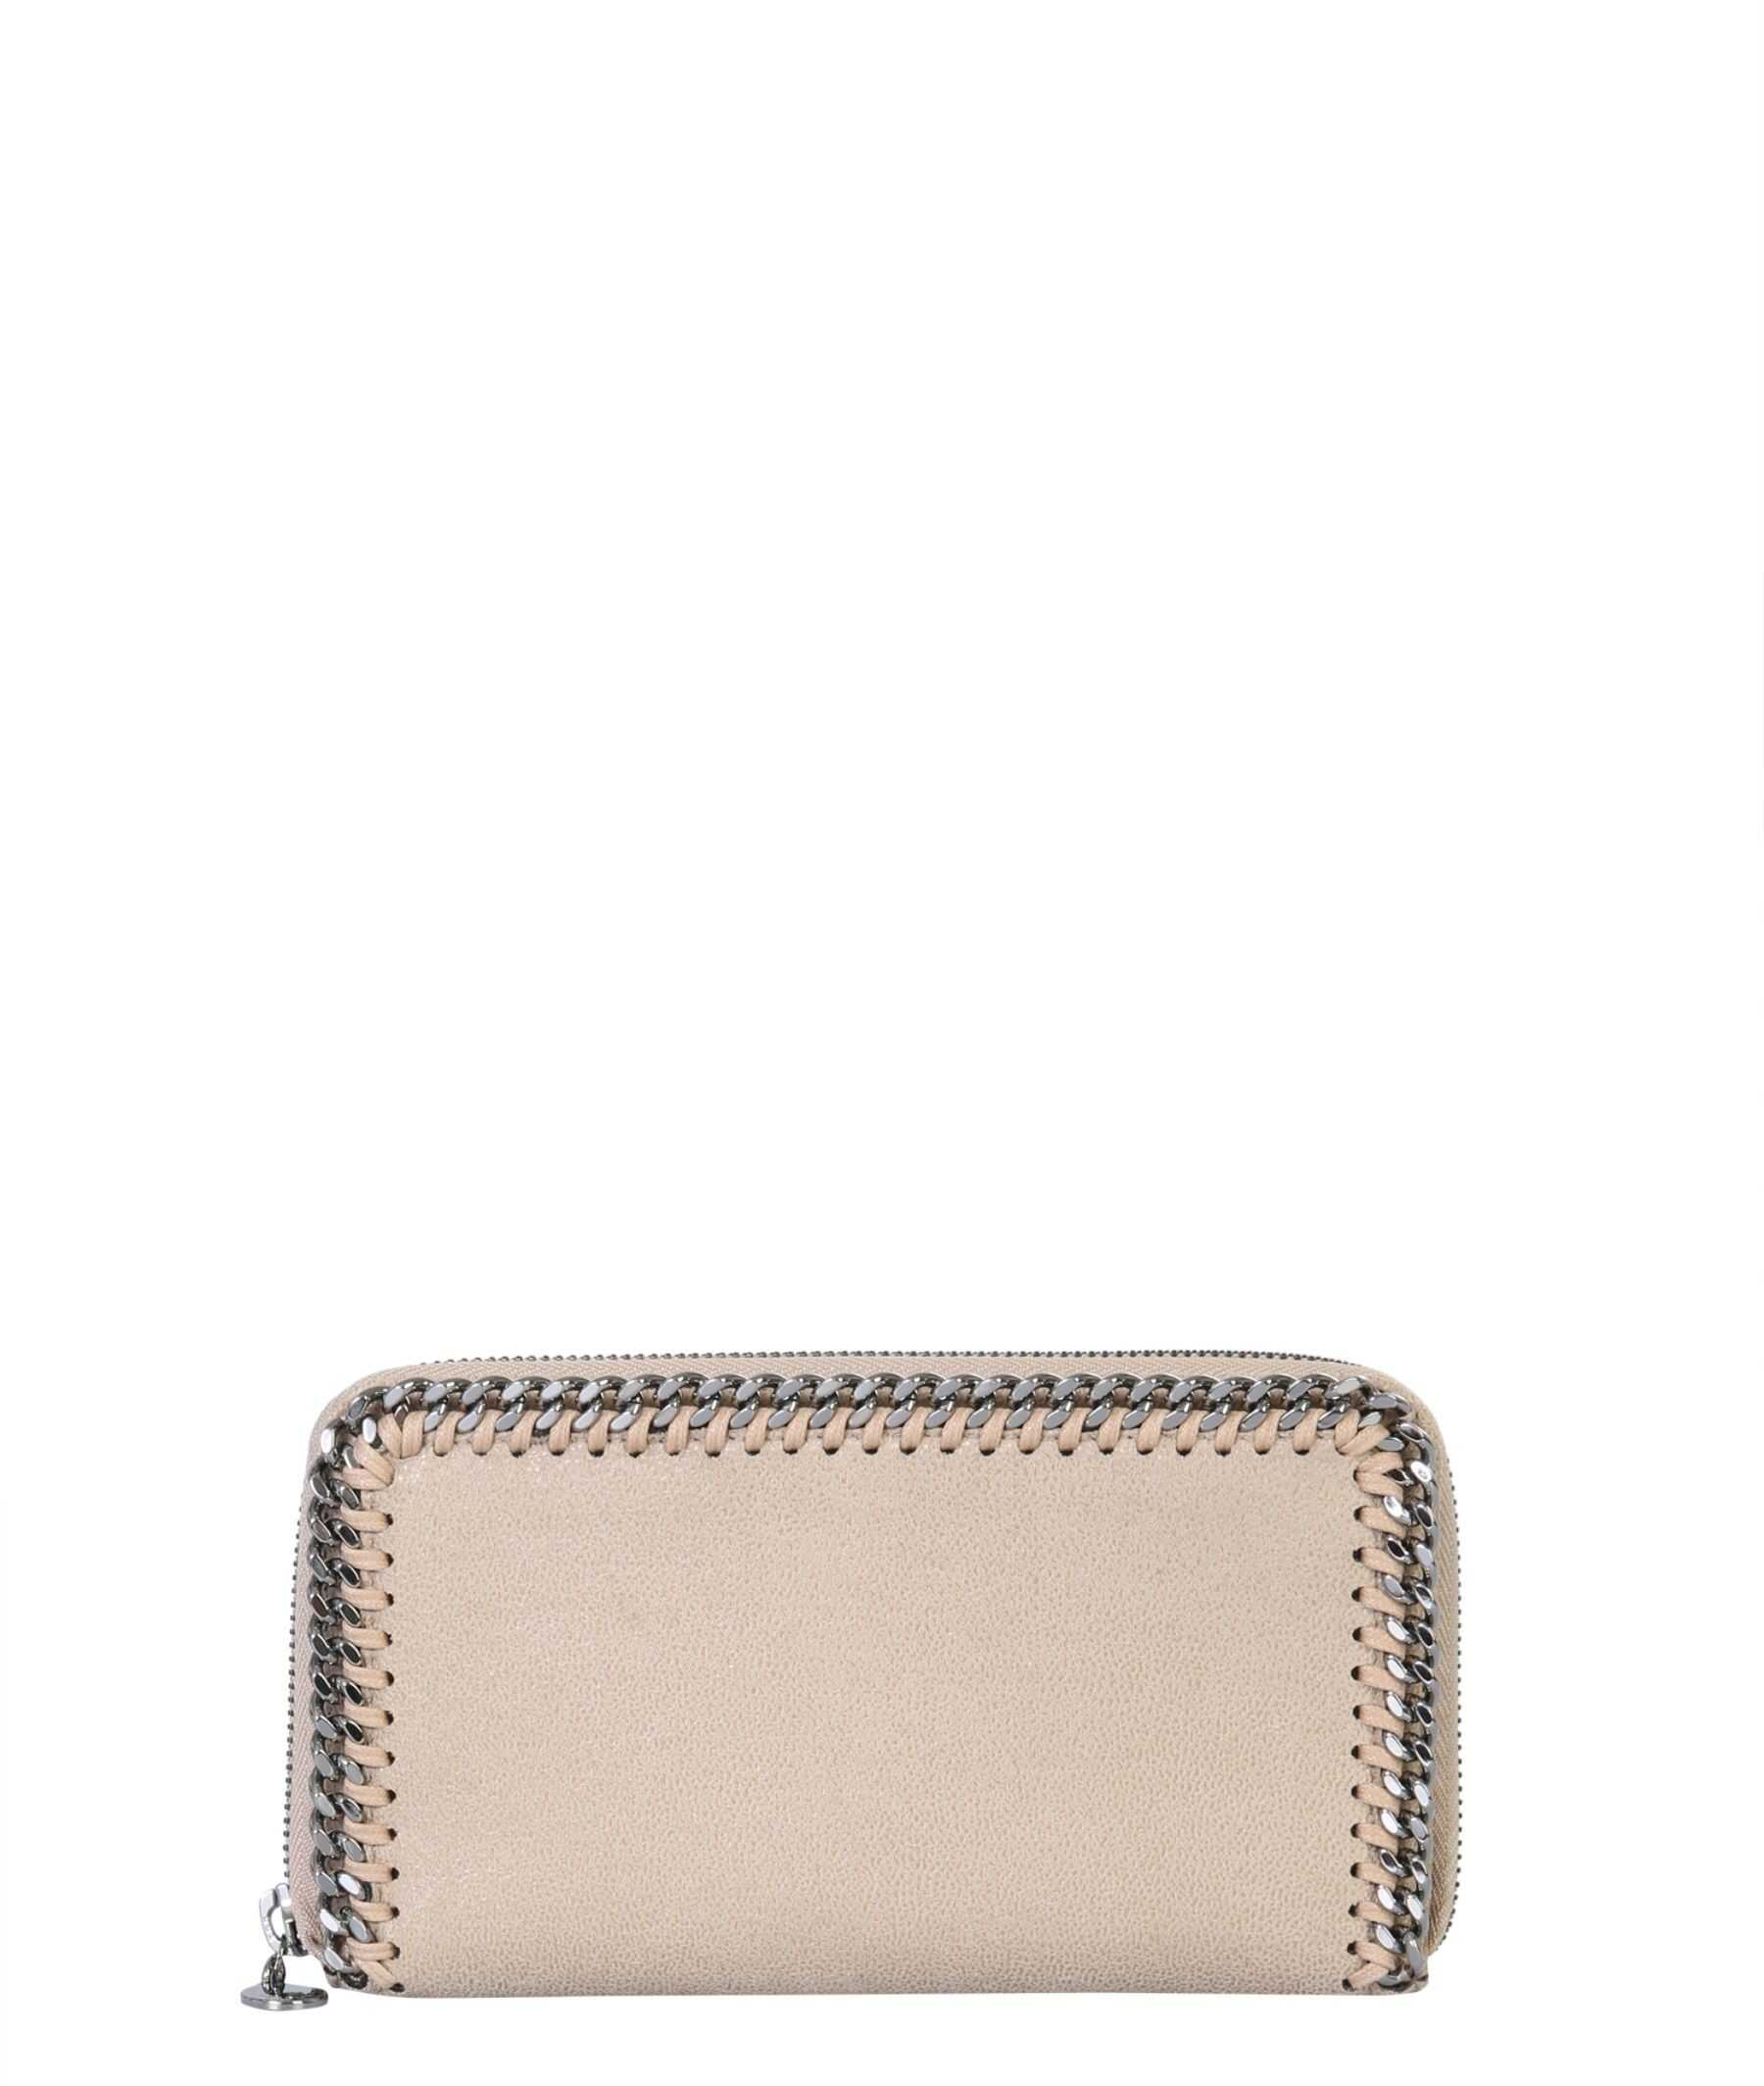 Zip Around Falabella Wallet